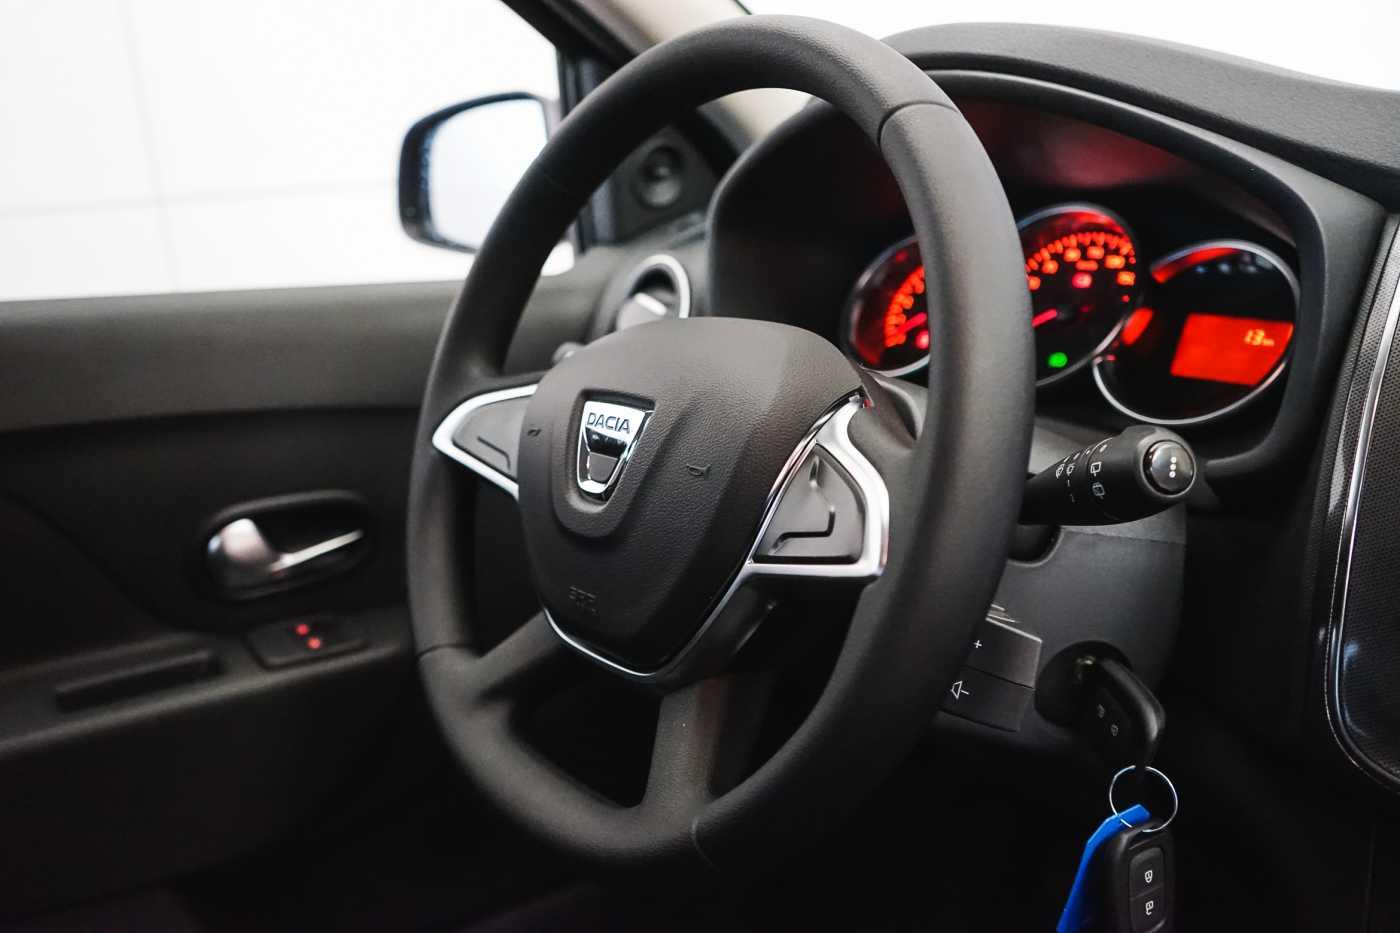 Dacia Sandero 1.0i SCe Stepway // Navi, Bluetooth, Airco, USB 20/27